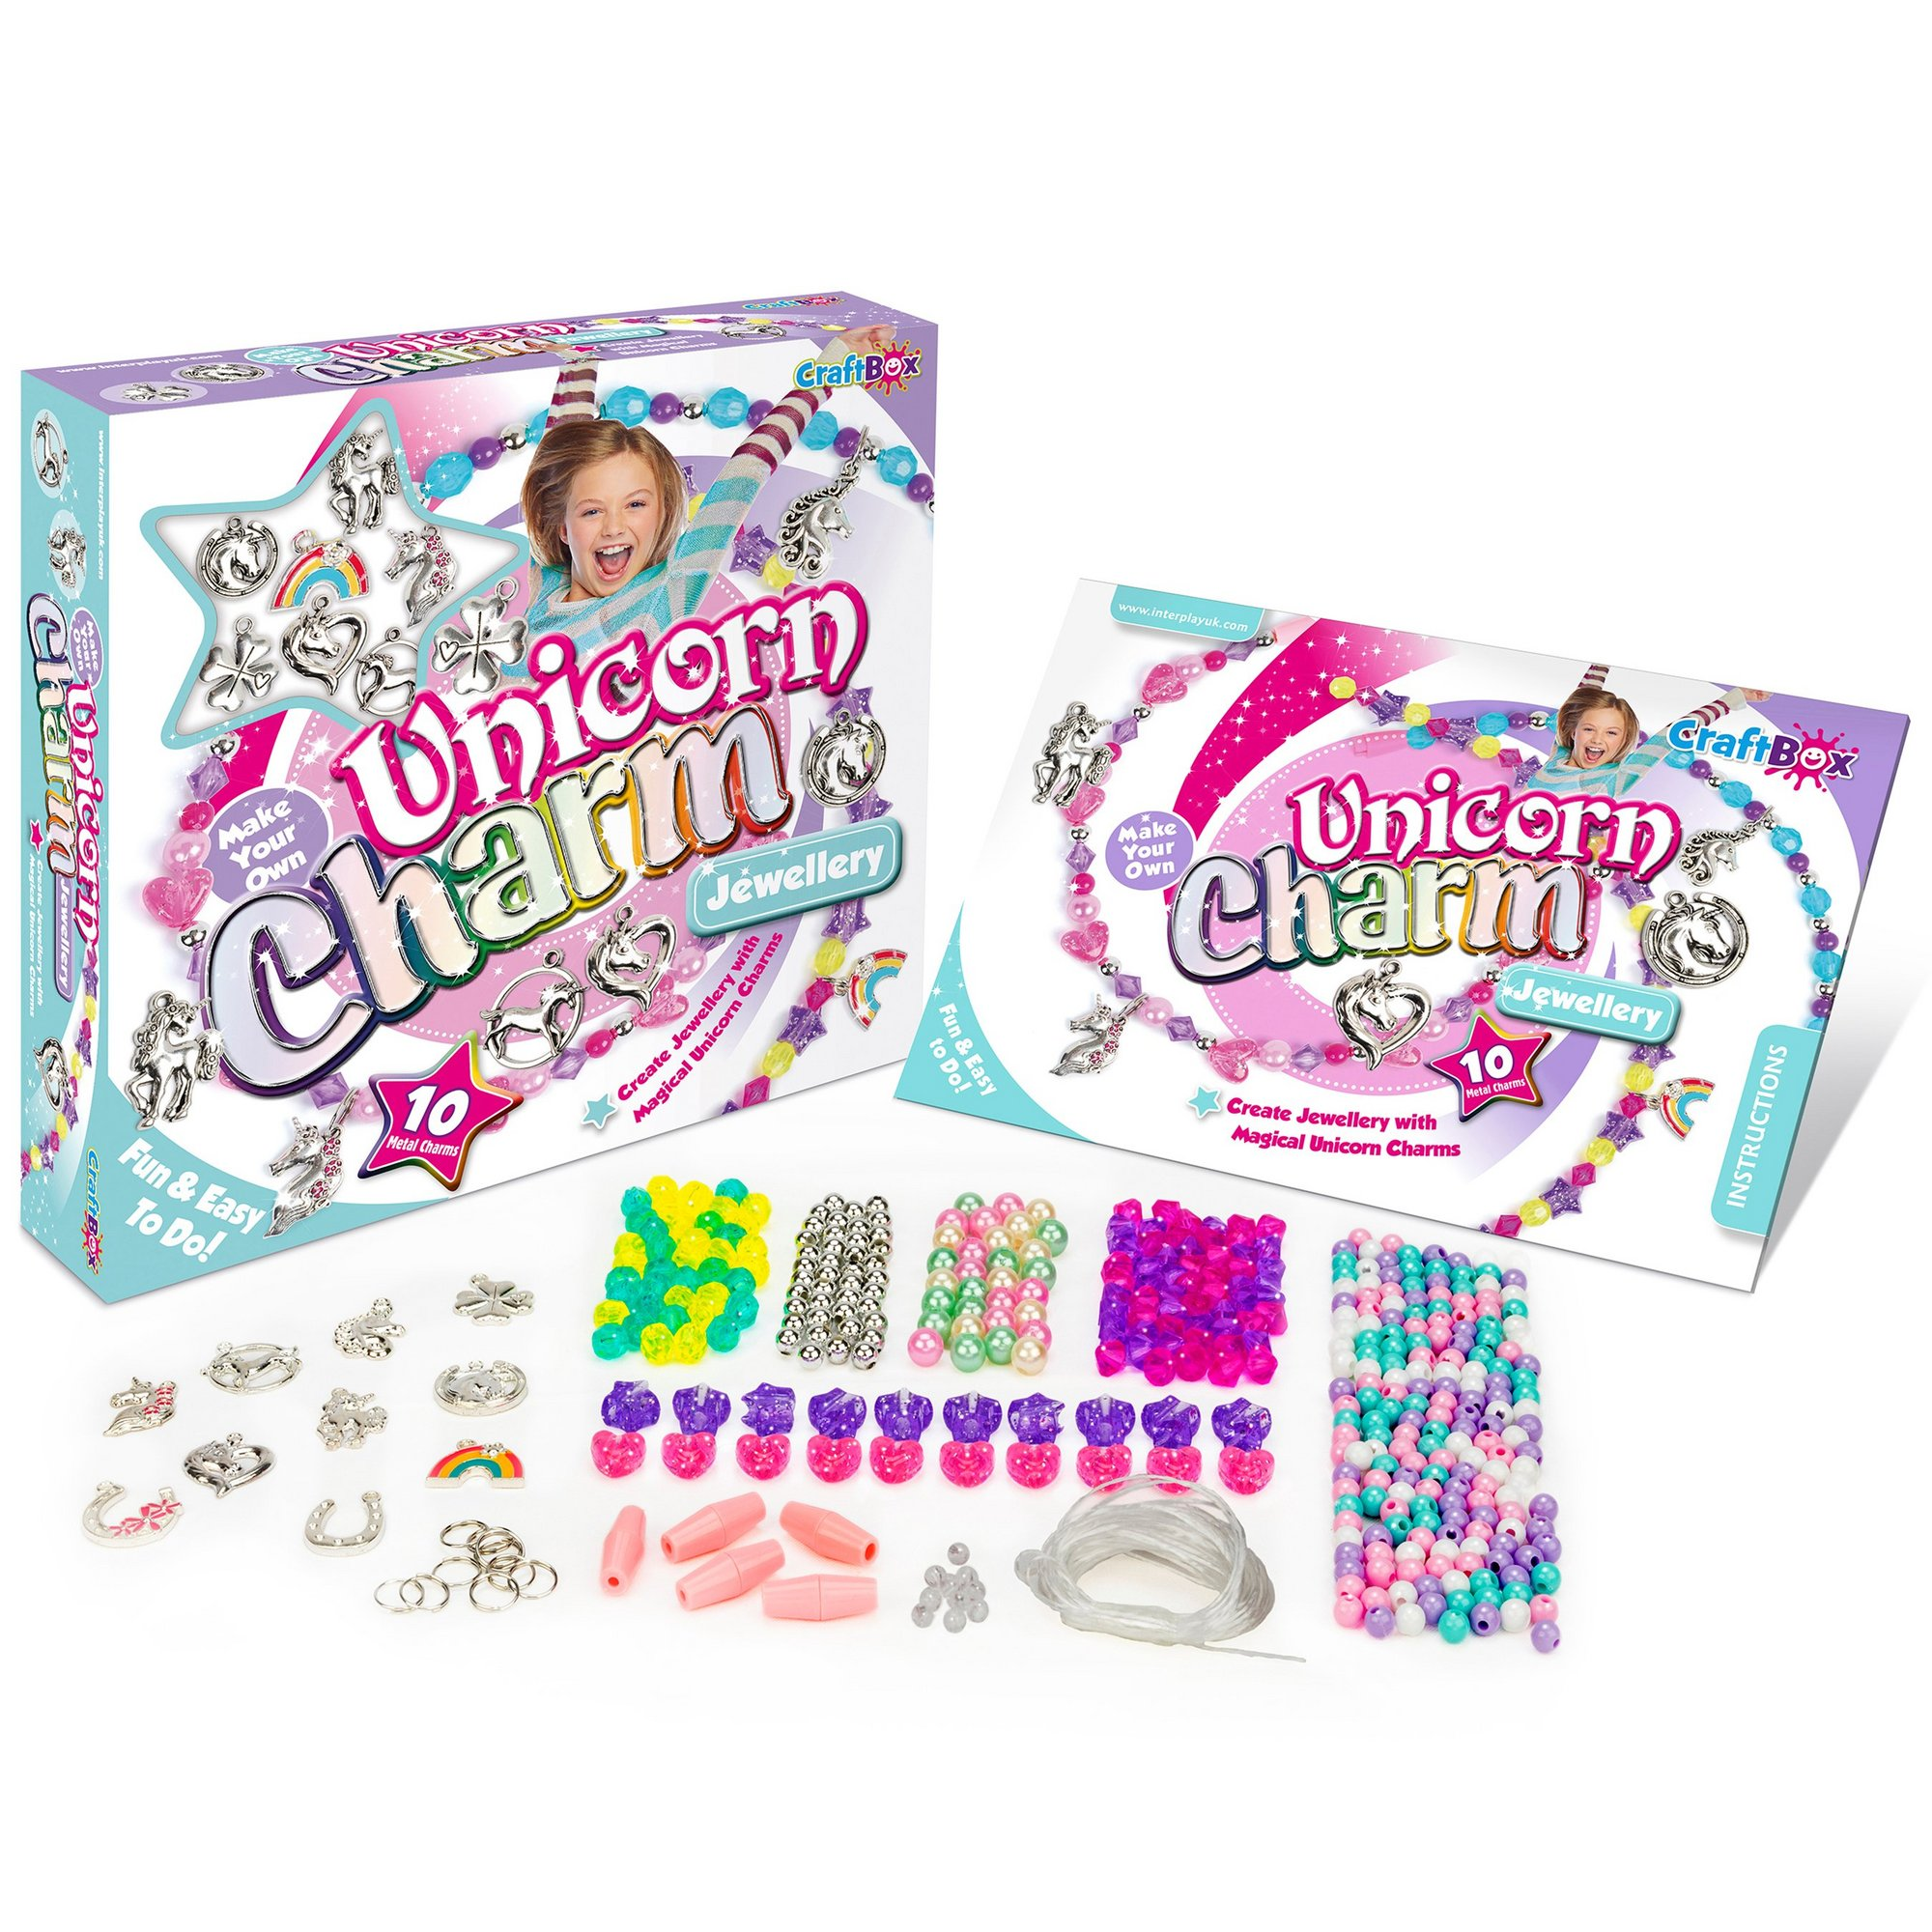 Image of Craft Box Unicorn Charm Jewellery